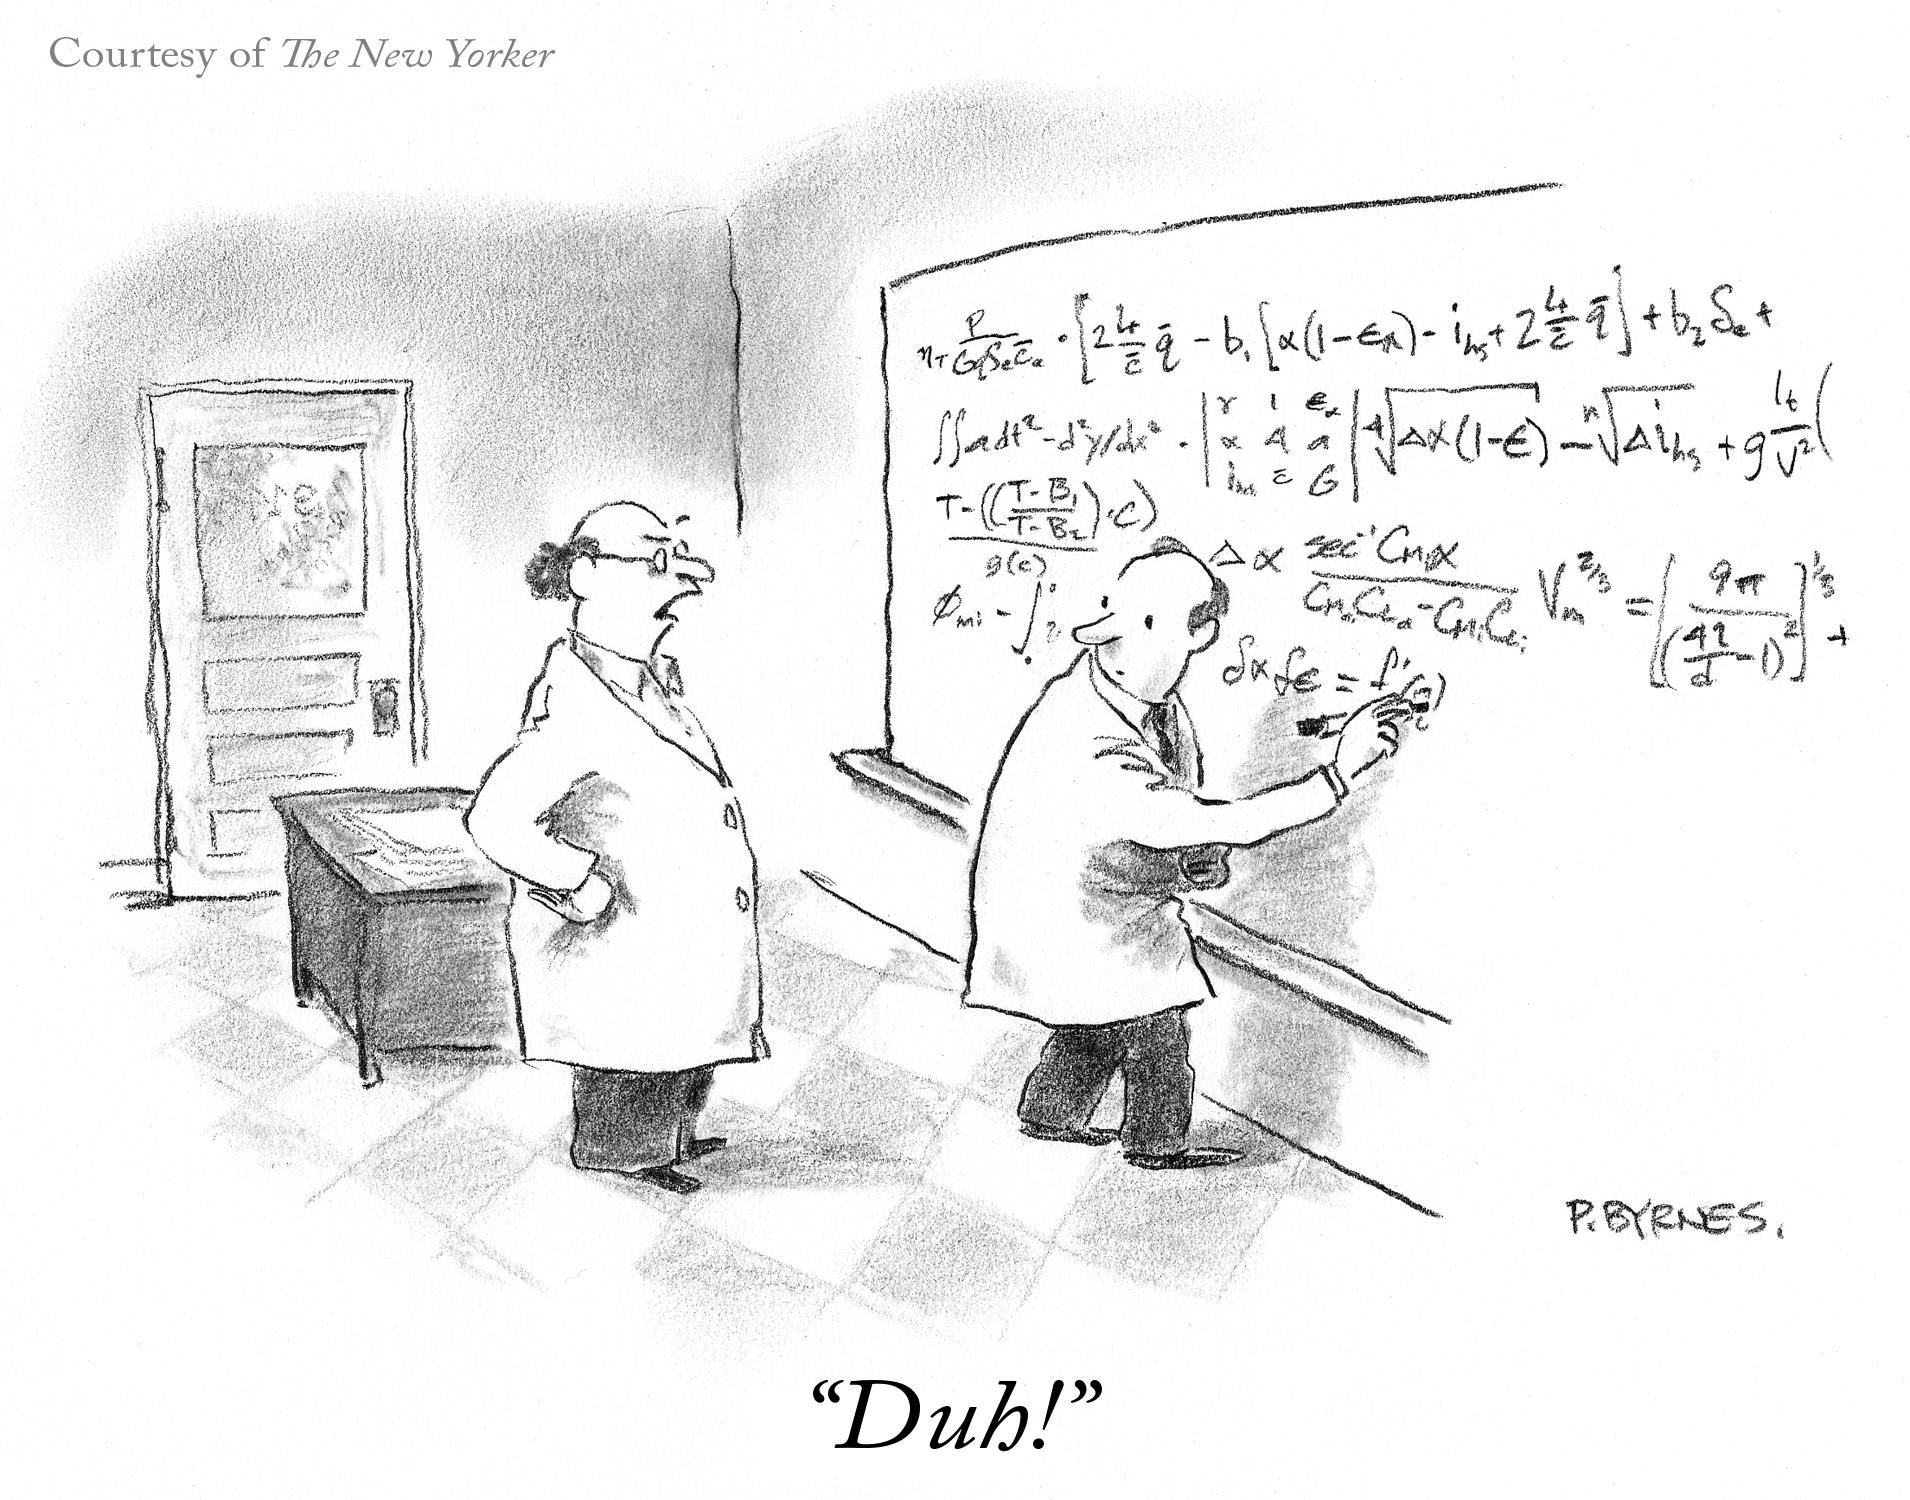 The New Yorker Cartoonists Present: IC - Intensive Creativity